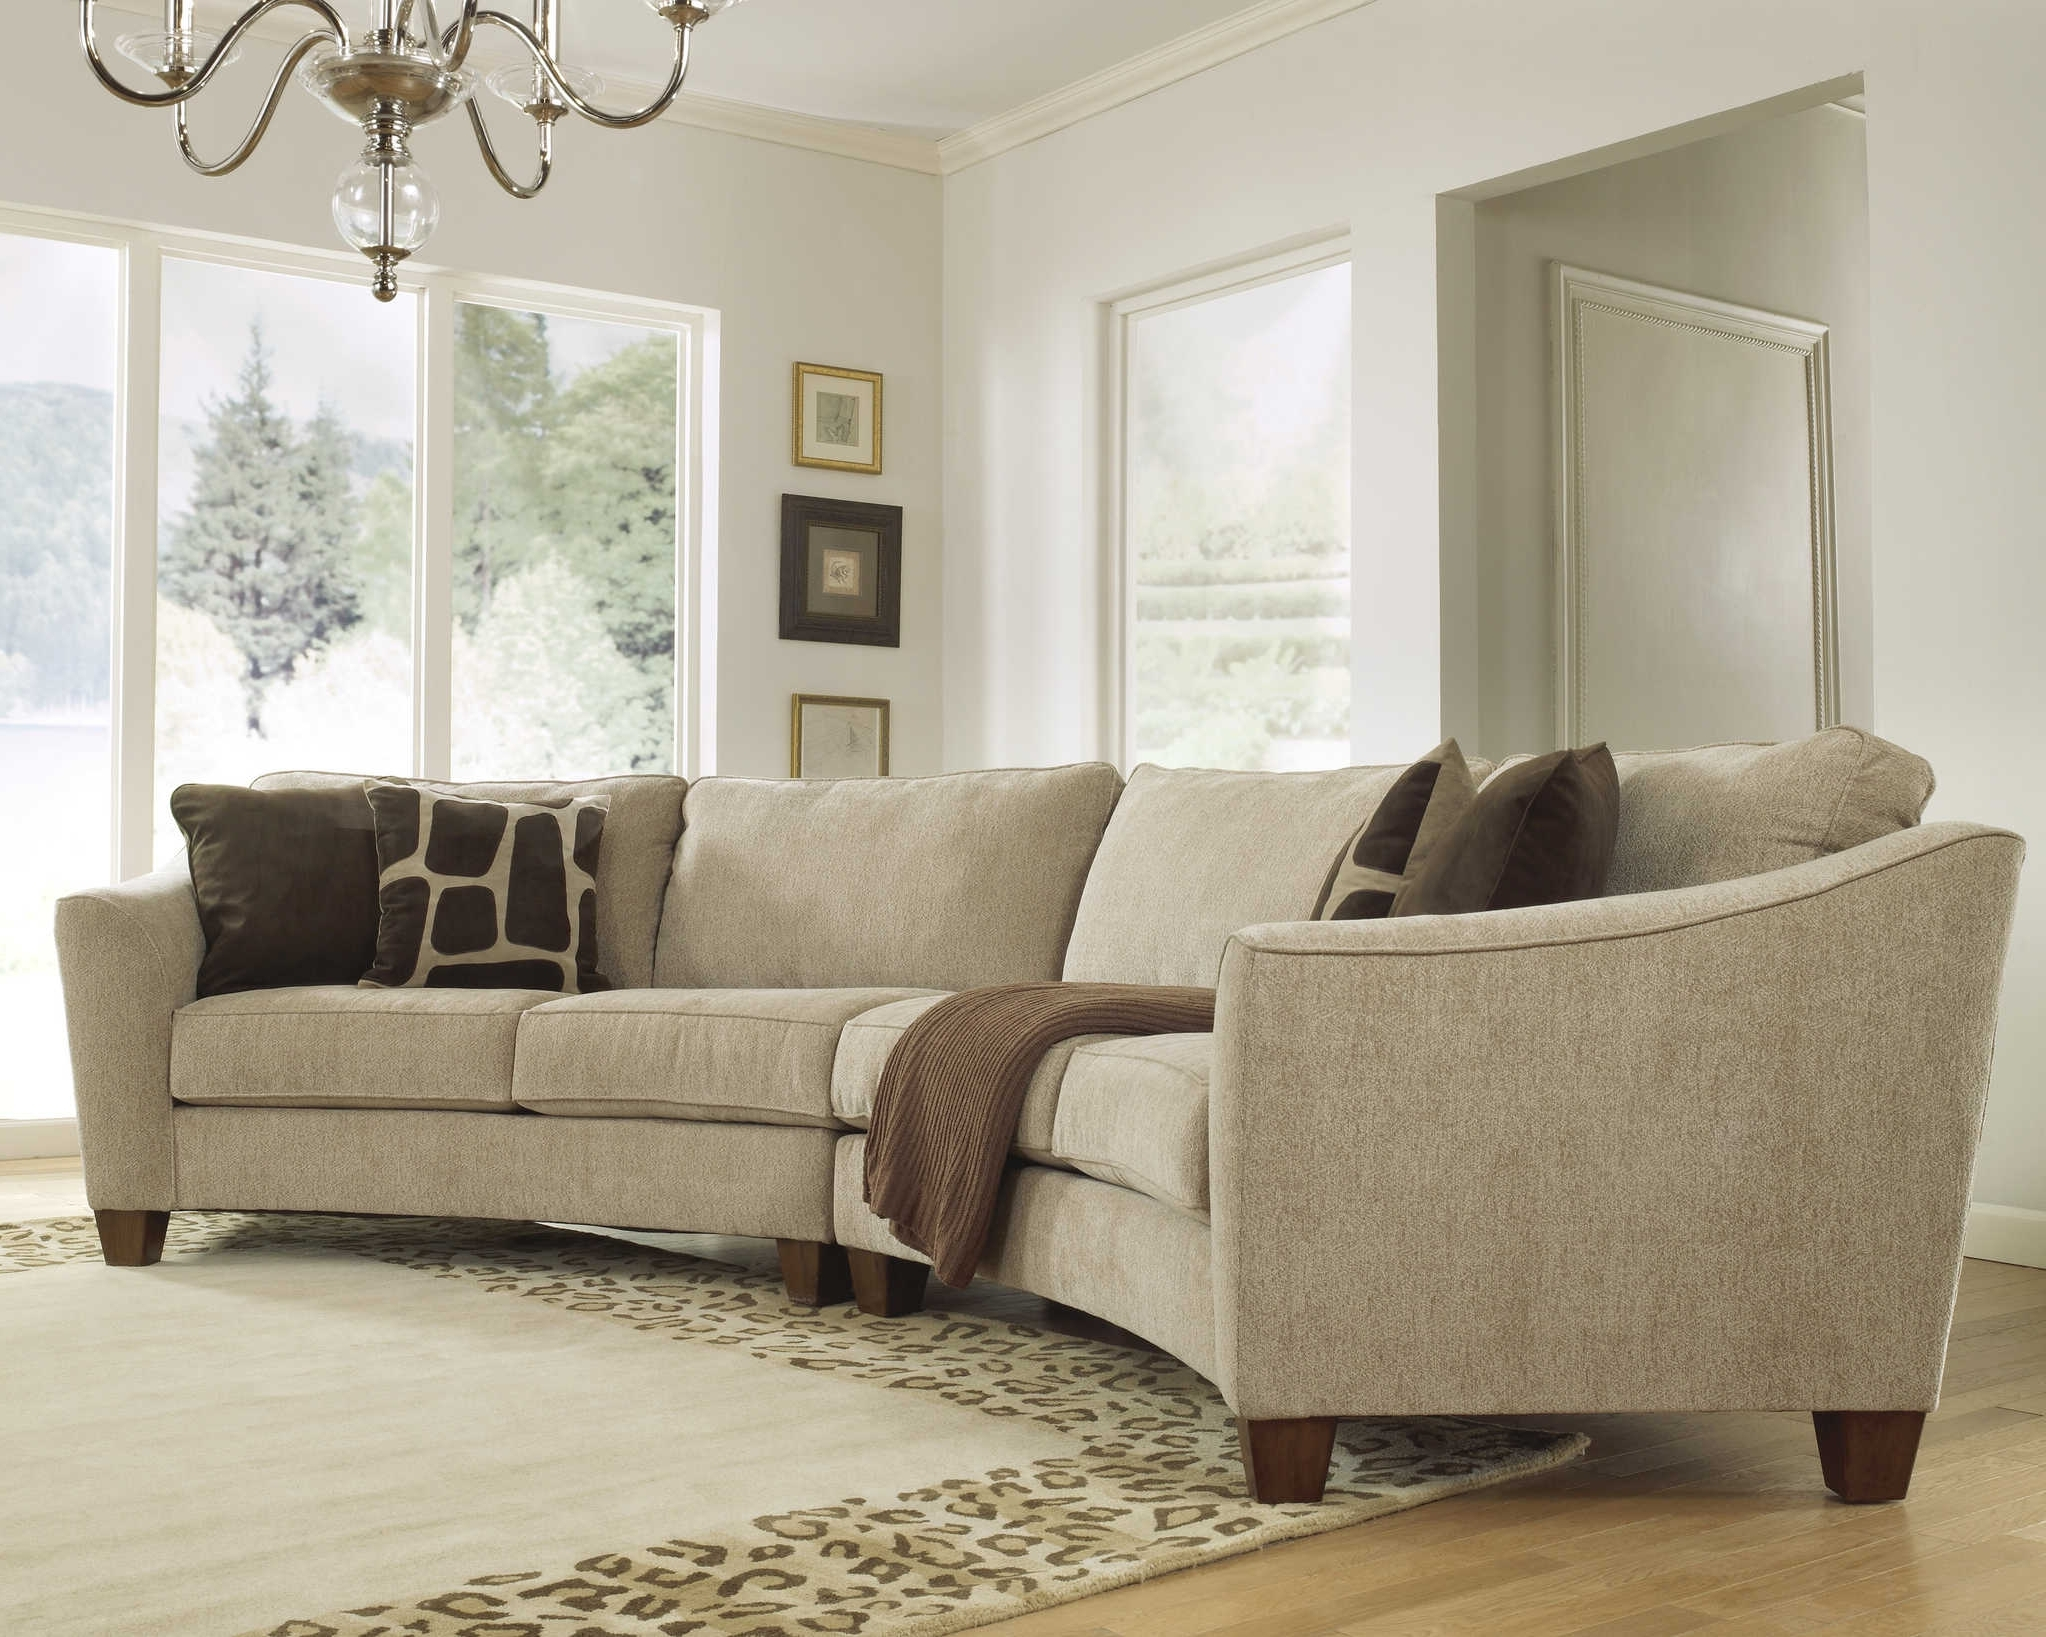 Bedroom: Ashley Furniture Wichita Ks Cozy Beautiful White Sofa Intended For Preferred Wichita Ks Sectional Sofas (View 2 of 20)